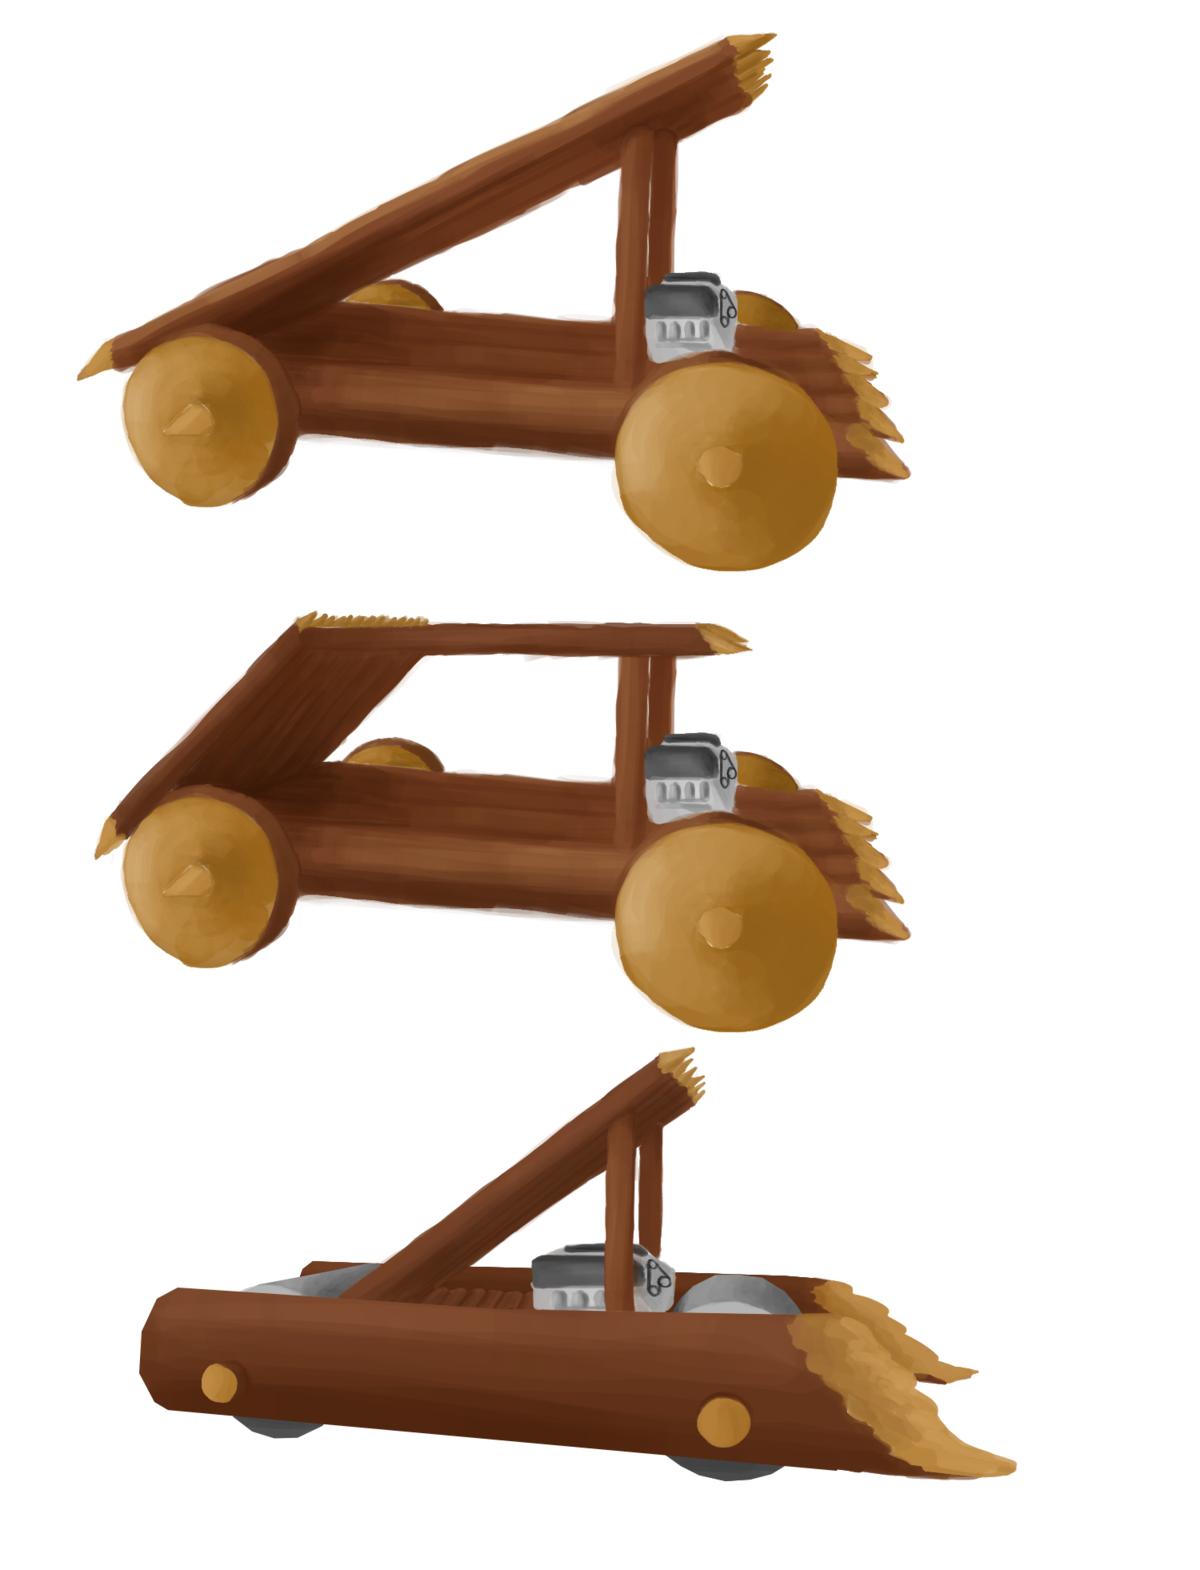 Babarian's car concept